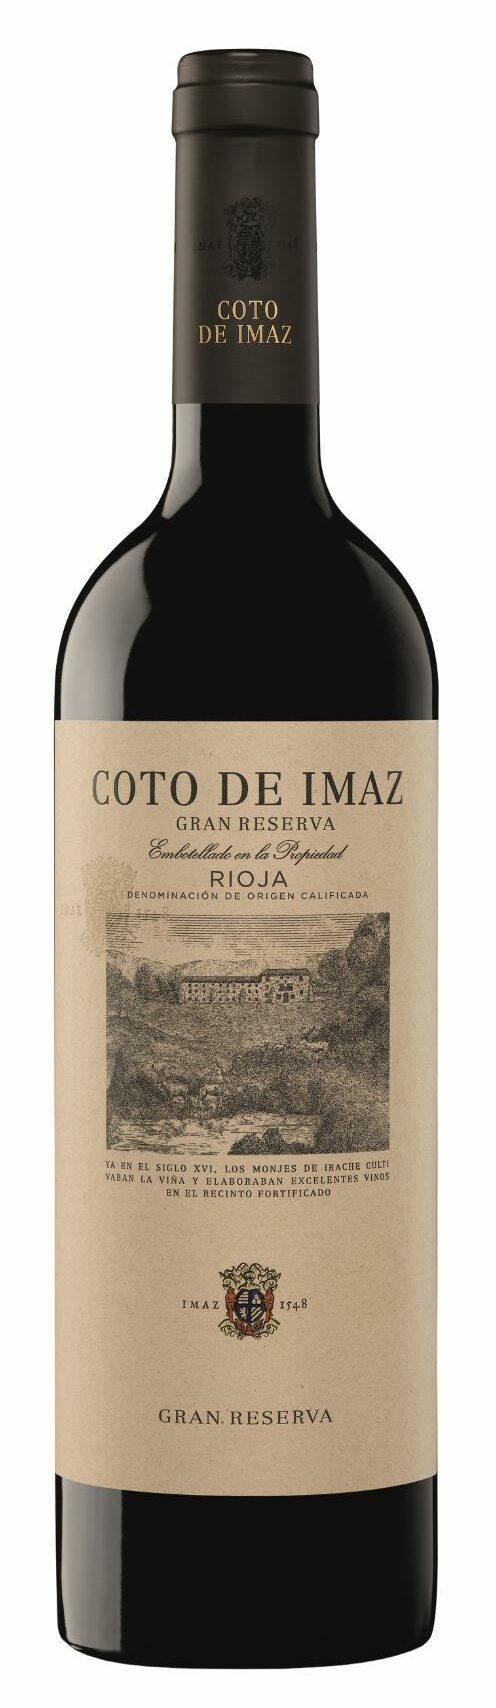 Coto De Imaz Gran Reserva Rioja Wine - Spec's Wines, Spirits & Finer Foods